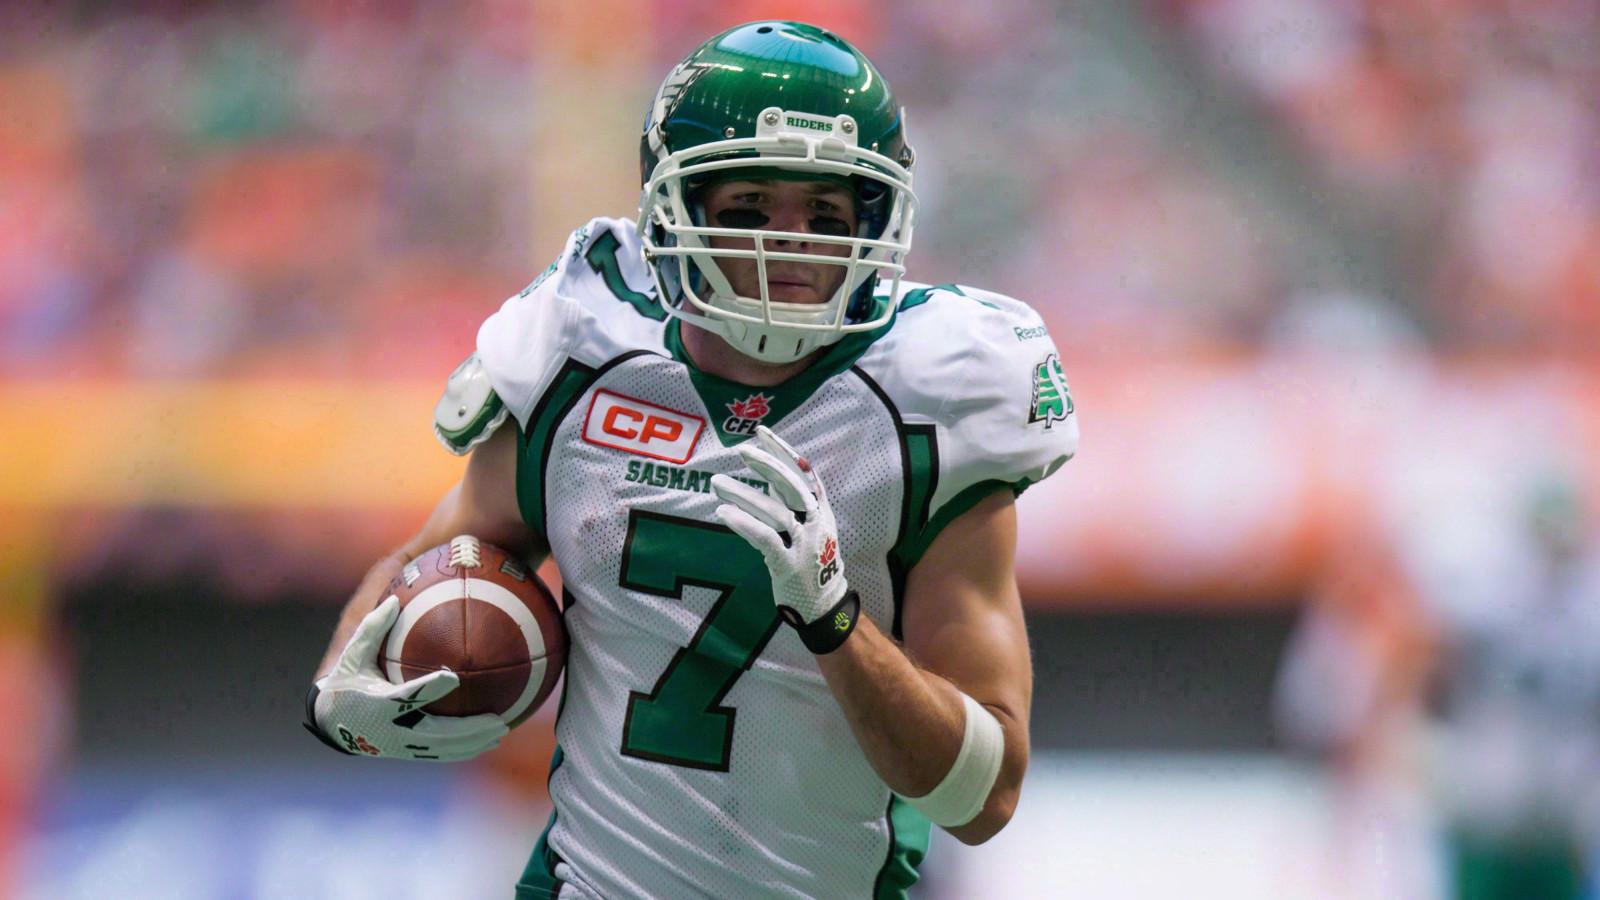 Saskatchewan Roughriders  Weston Dressler scores a touchdown against the  B.C. Lions during the first half fa8df27d1